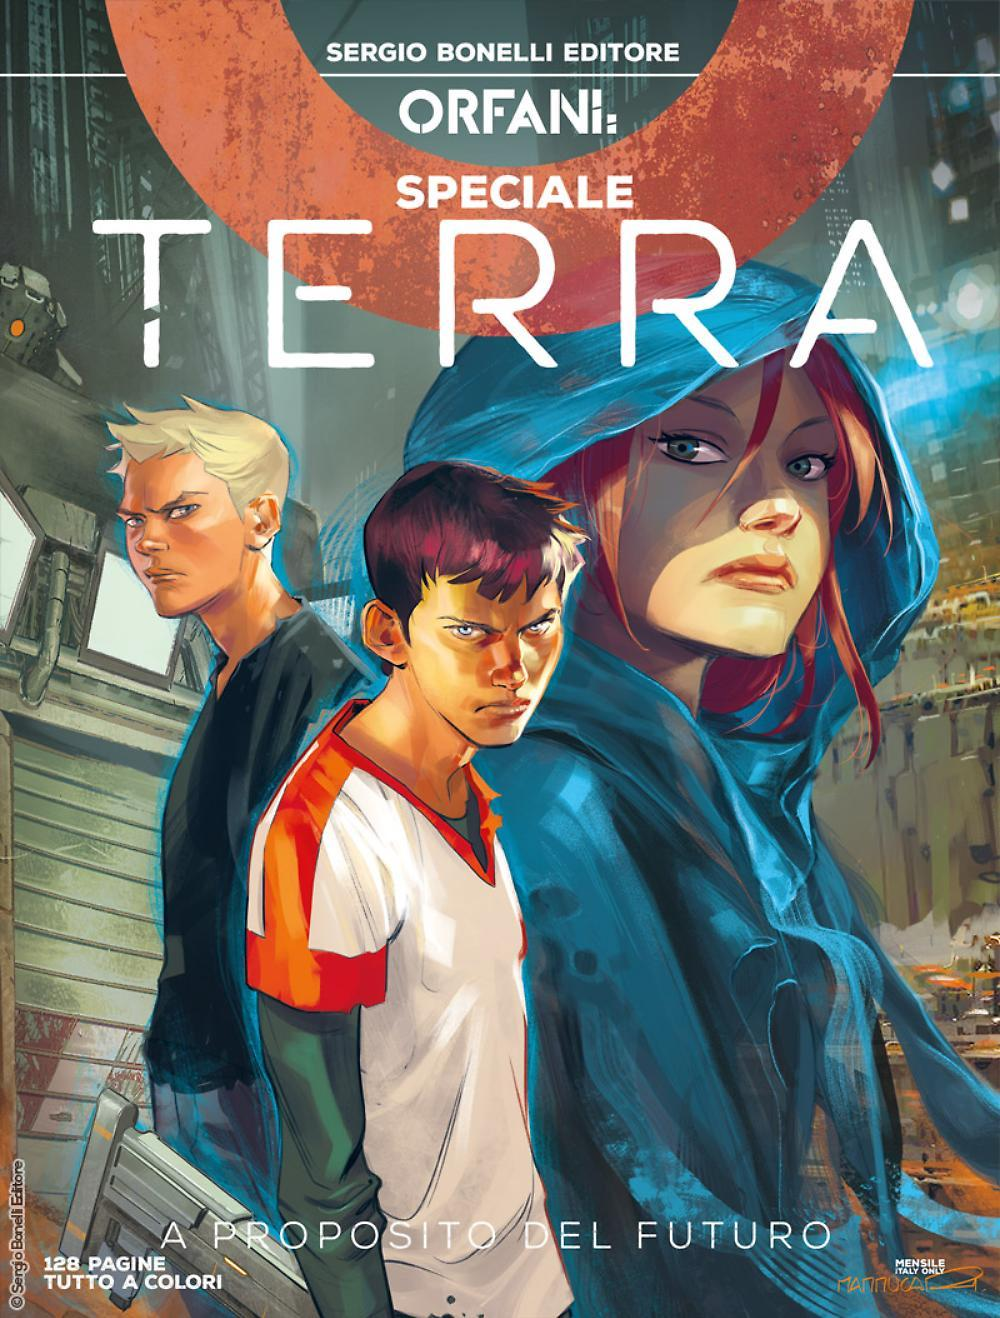 Orfani Speciale n. 1 : Terra